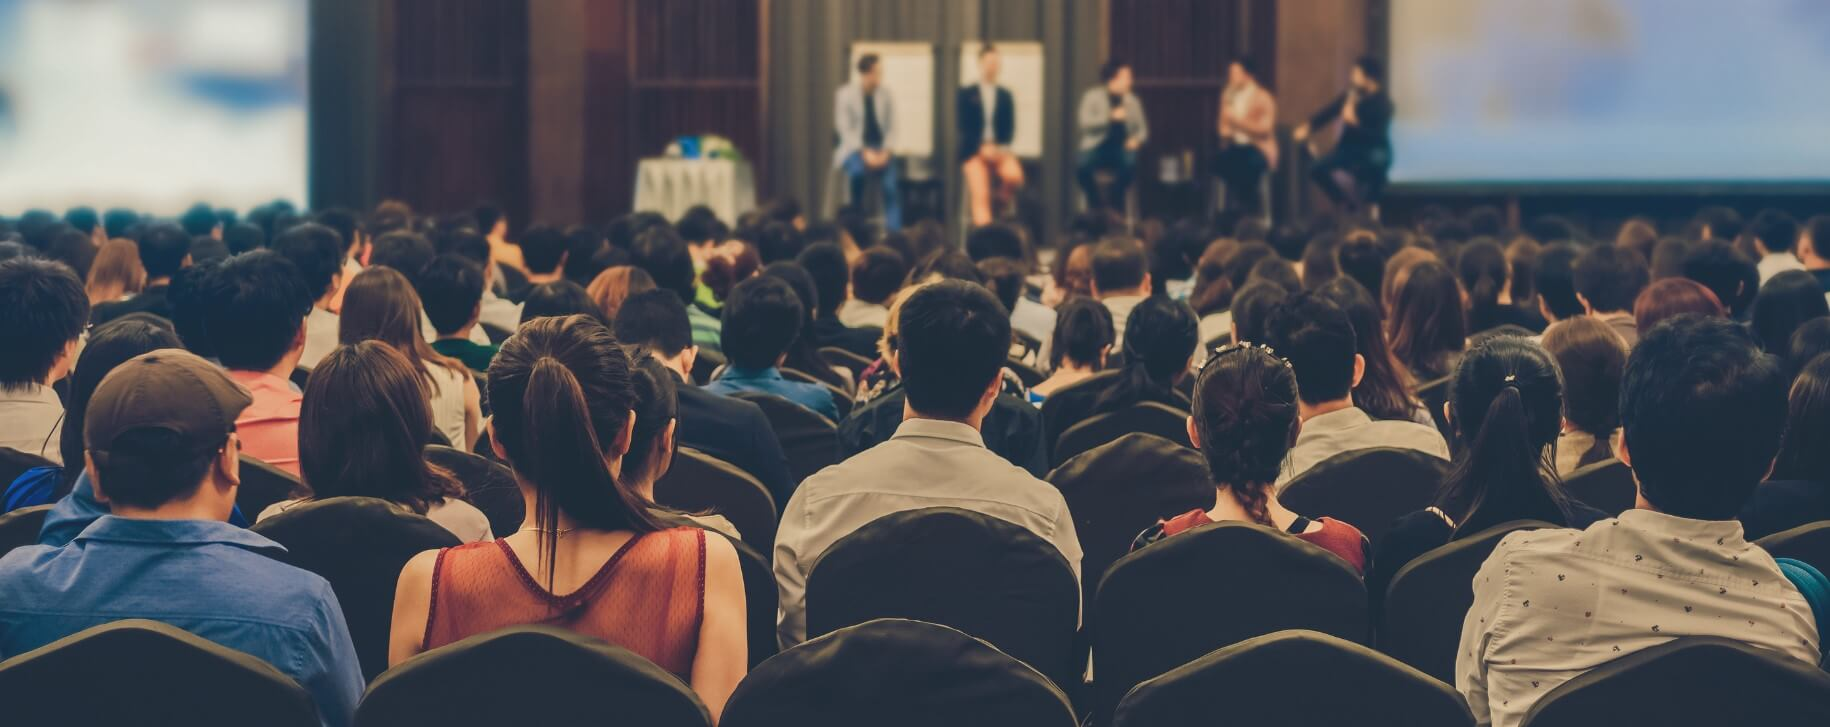 panel seminar conference